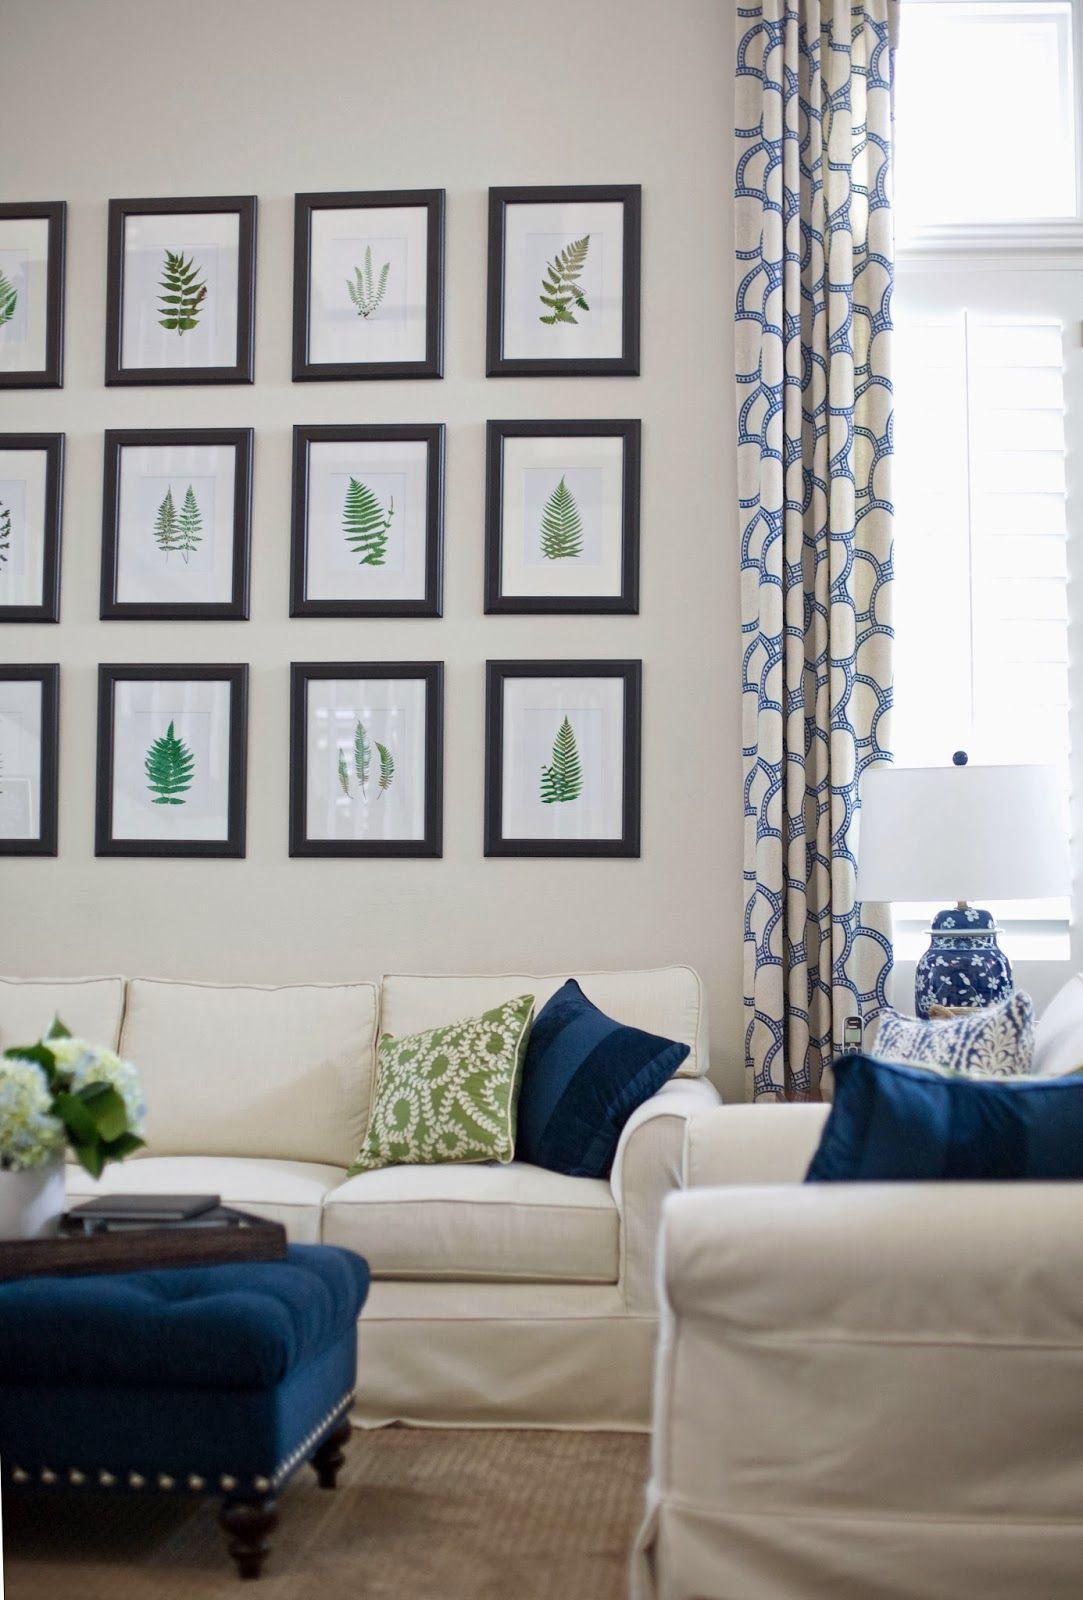 crisp muslin, C.B.I.D. HOME DECOR and DESIGN: EASY ELEGANCE | Paint ...